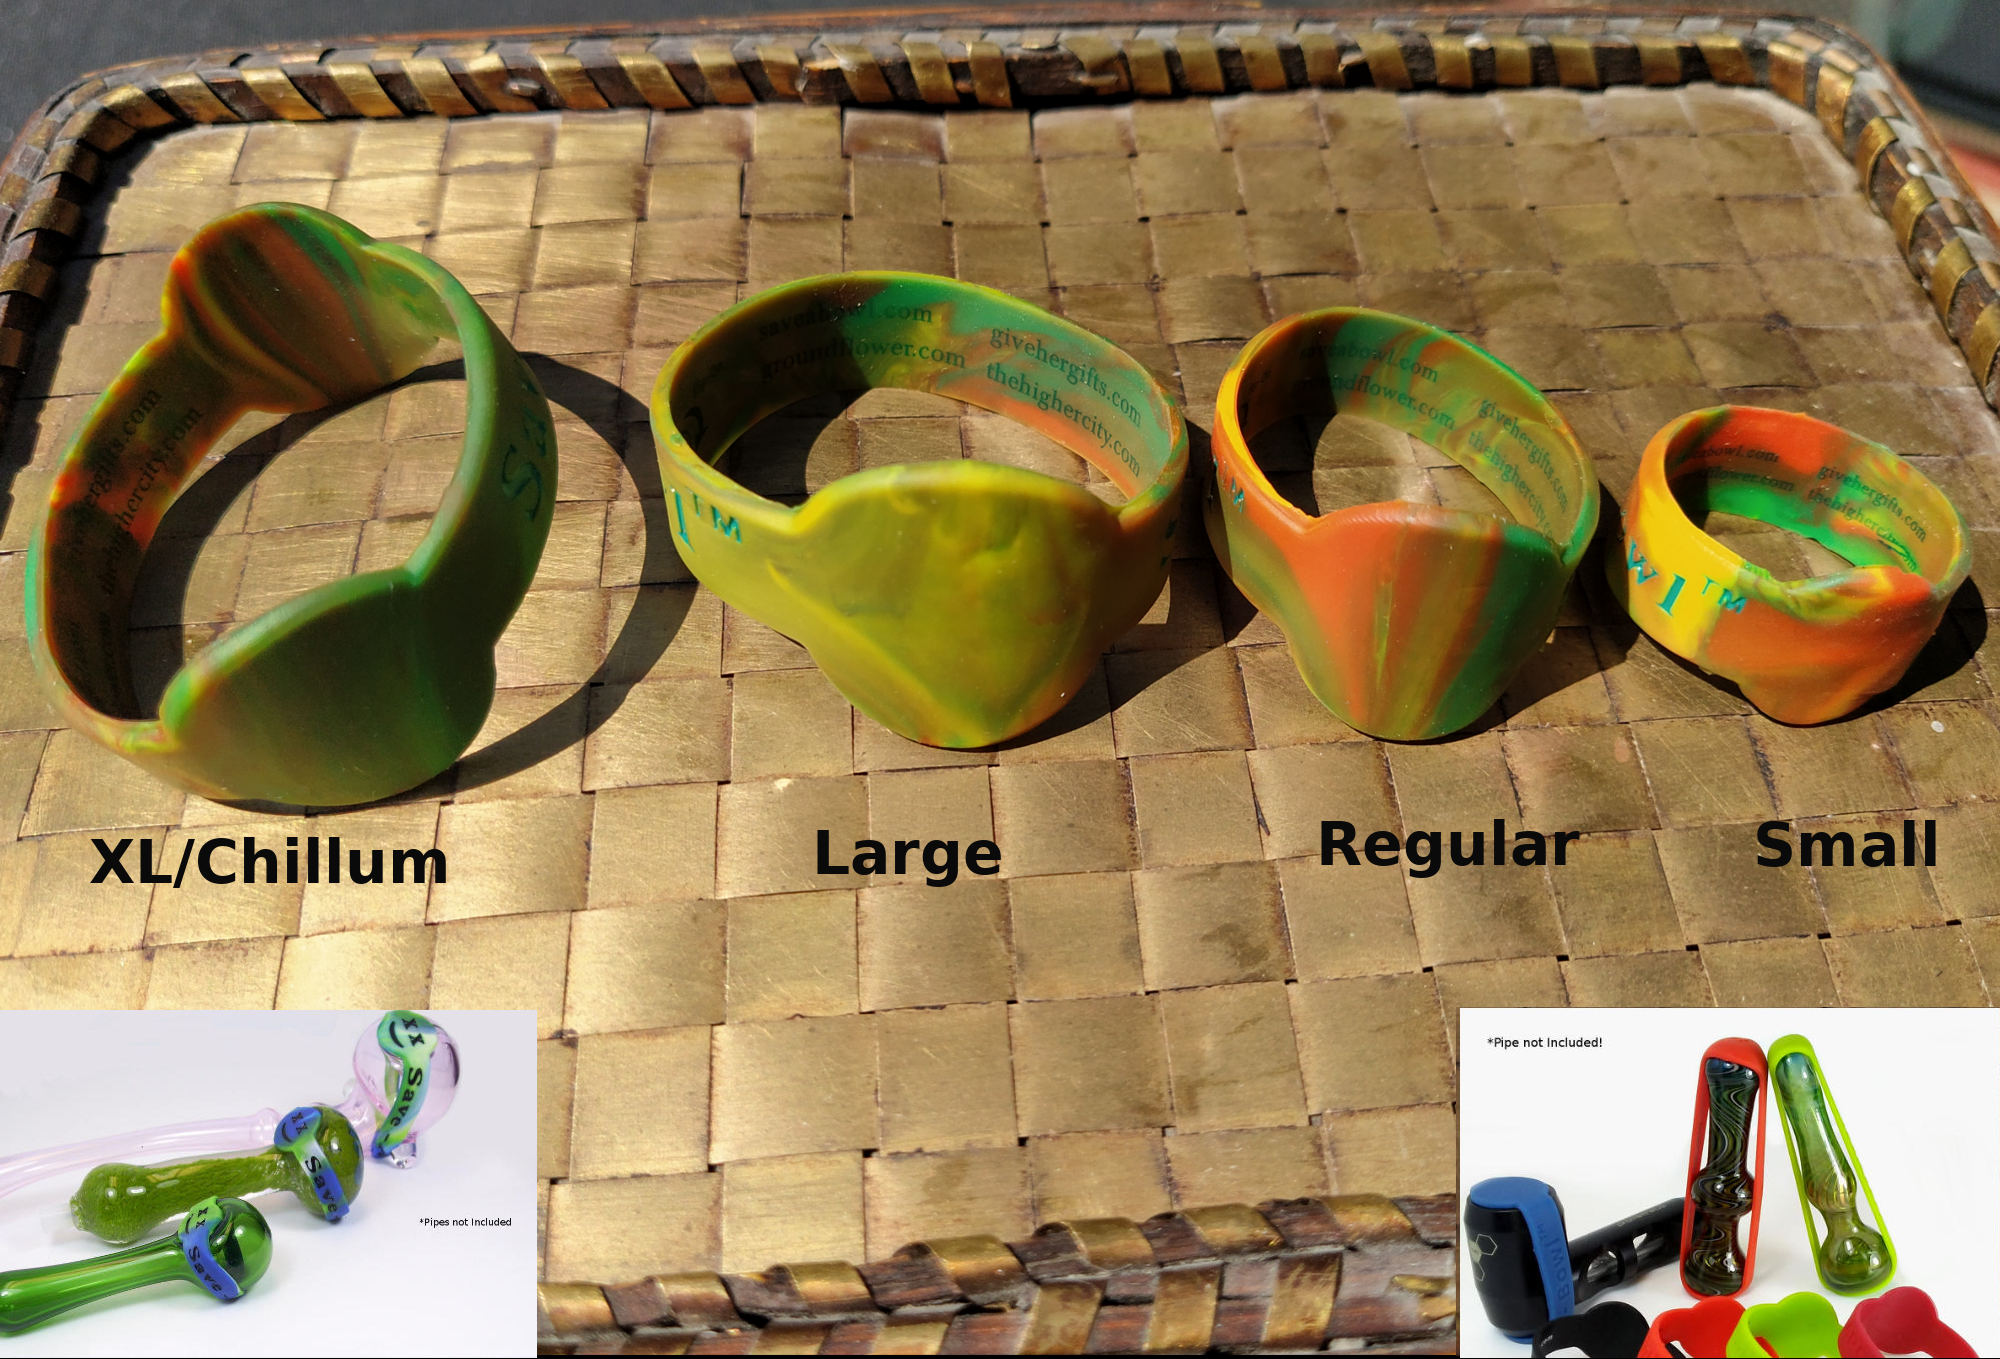 4 sizes of rasta save-a-bowls